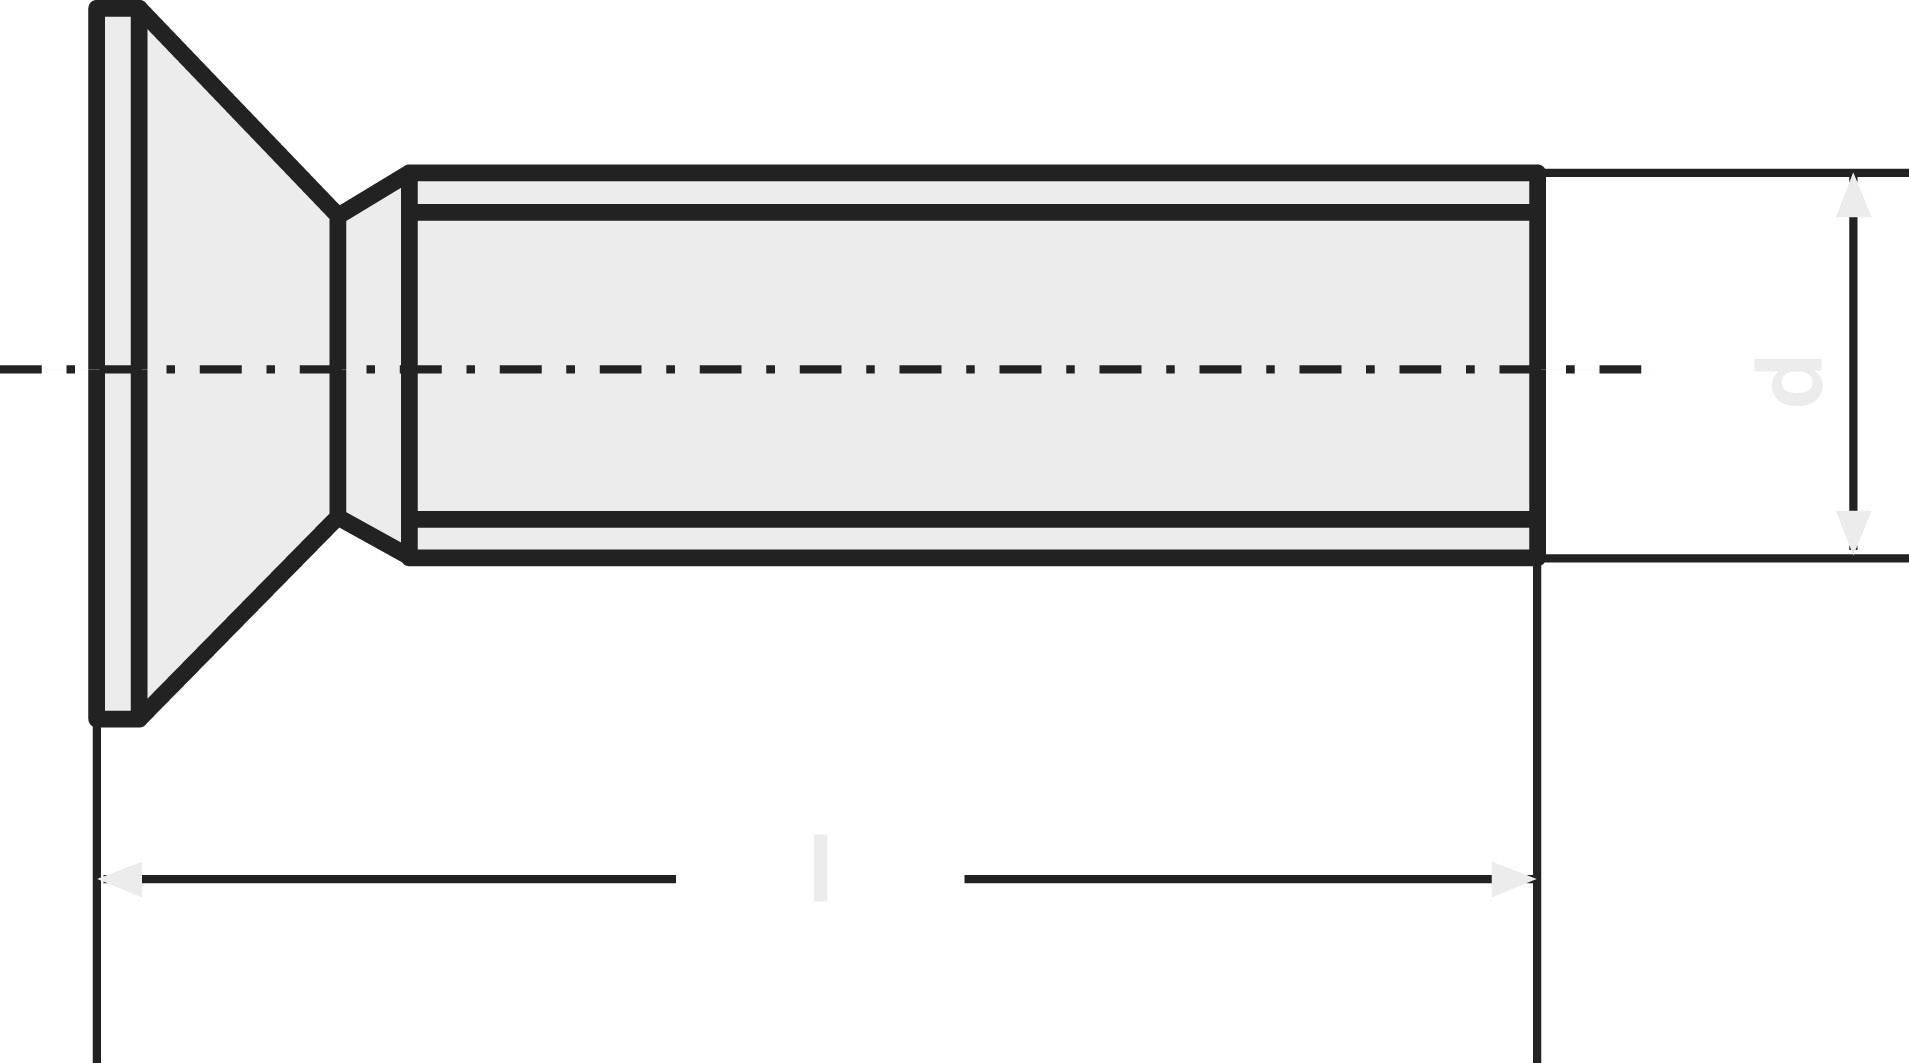 Zápustný šroub TOOLCRAFT 839910, Torx, M2,5, DIN 965, 8 mm, ušlechtilá ocel, 20 ks